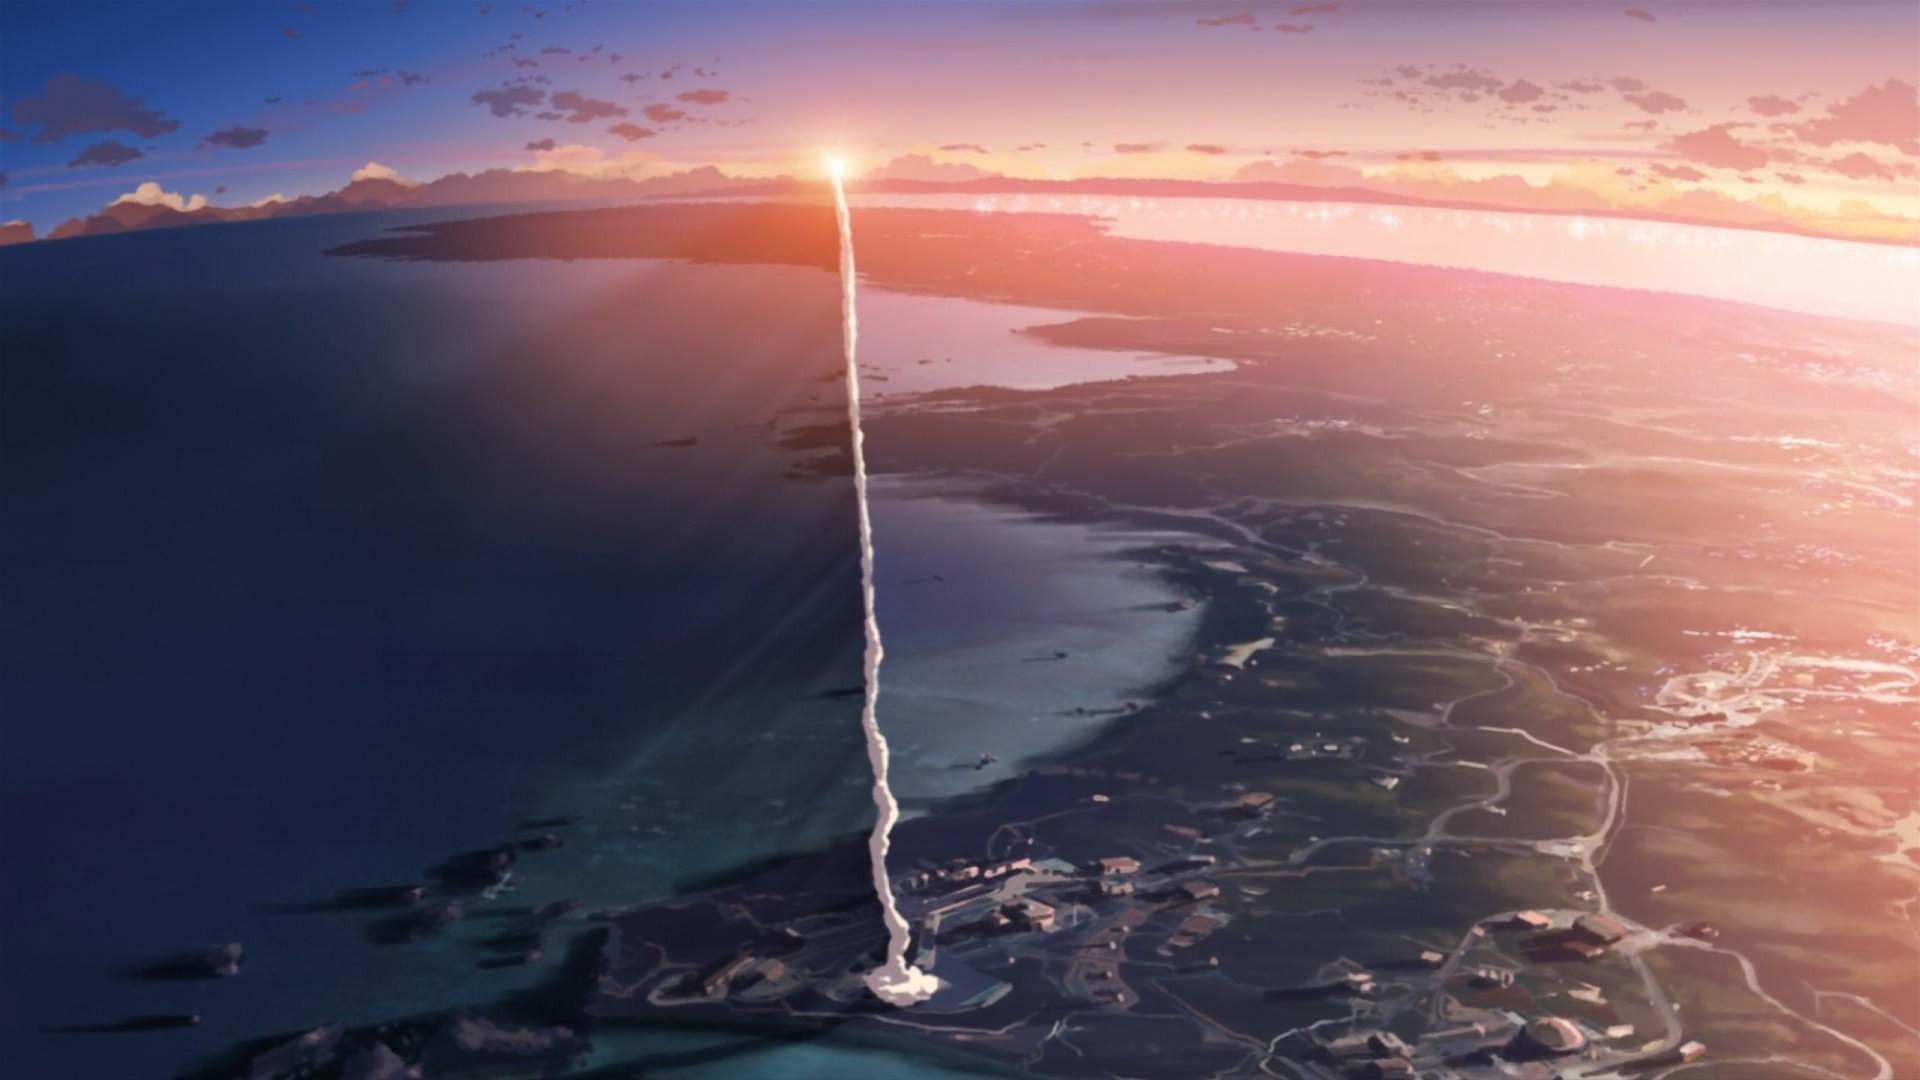 Rockets Smoke Sunset Japan Anime 5 Centimeters Per - 5 Centimeters Per Second Rocket , HD Wallpaper & Backgrounds